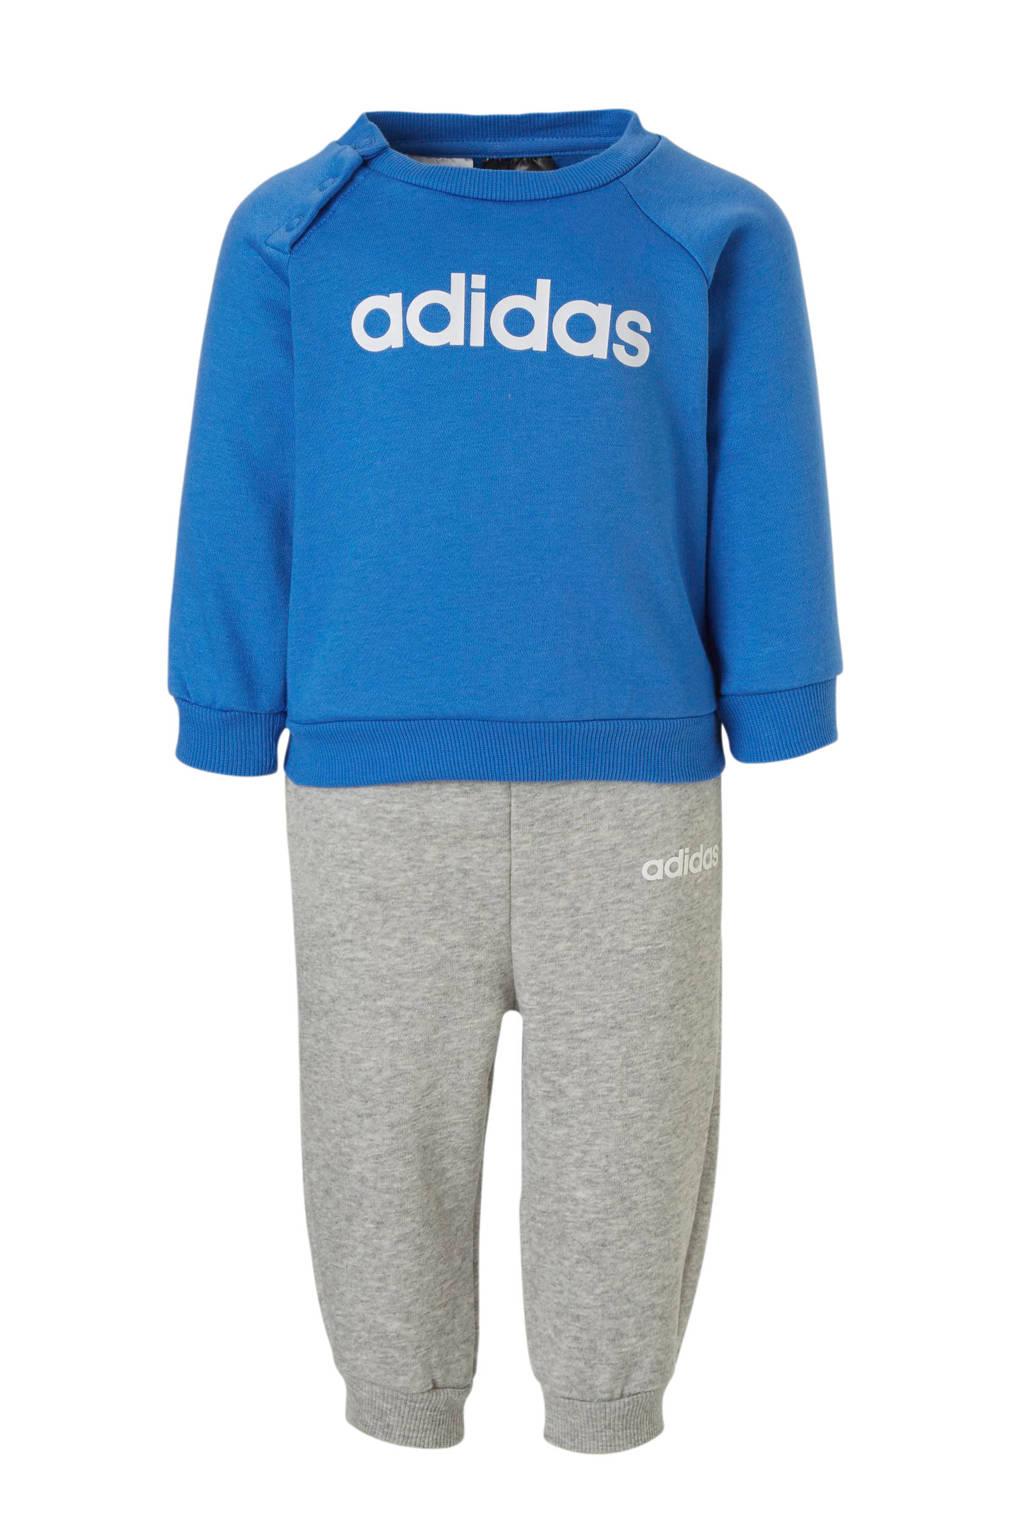 adidas performance   joggingpak blauw/grijs, Blauw/grijs